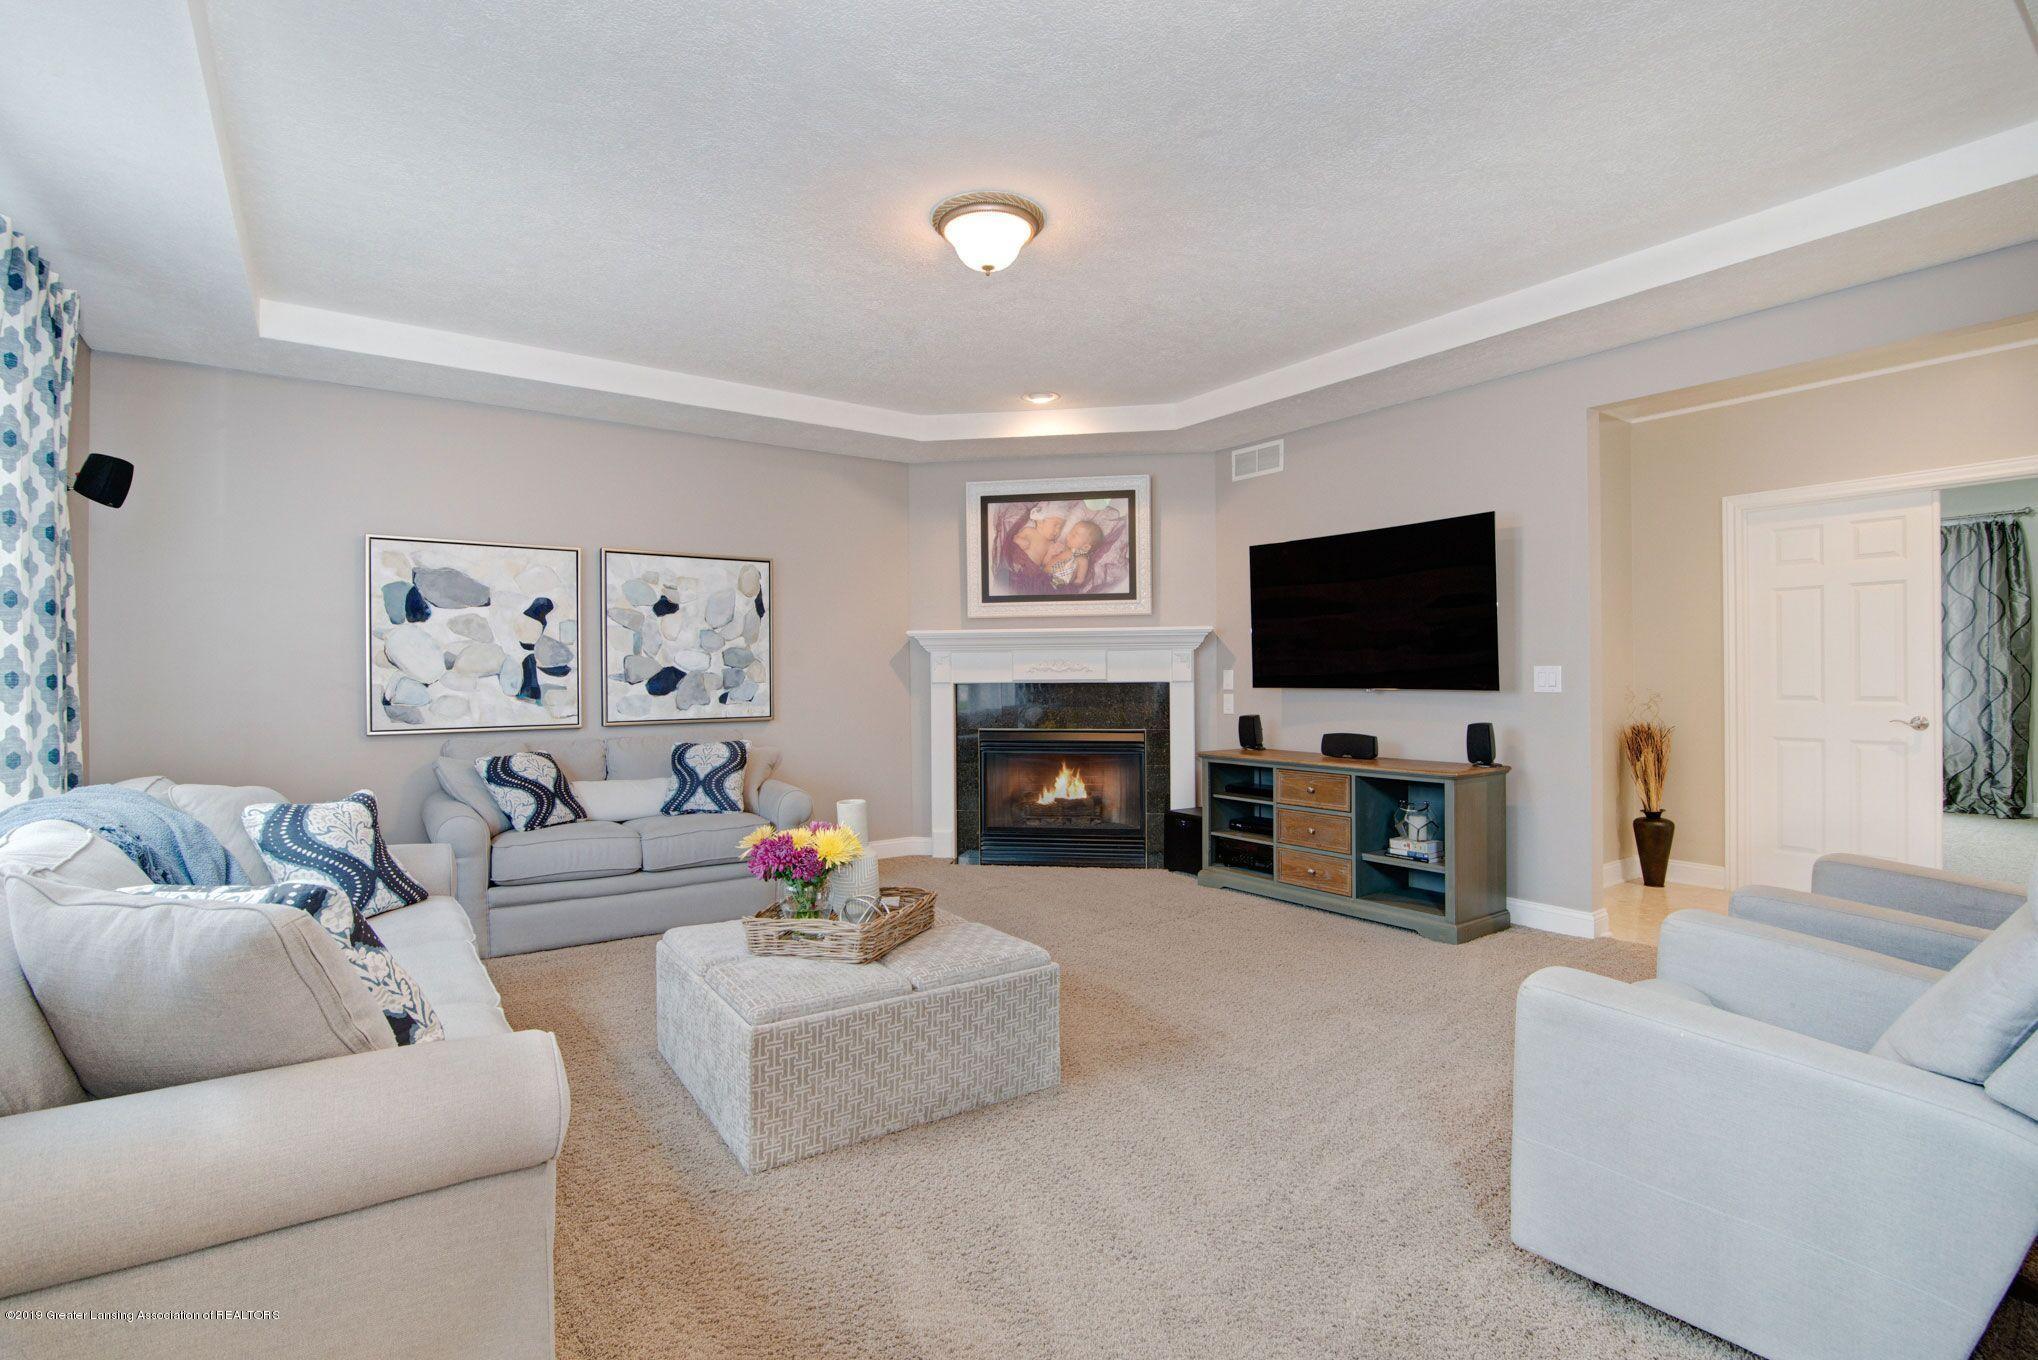 6389 Ridgepond Dr - Living Room 1 - 3